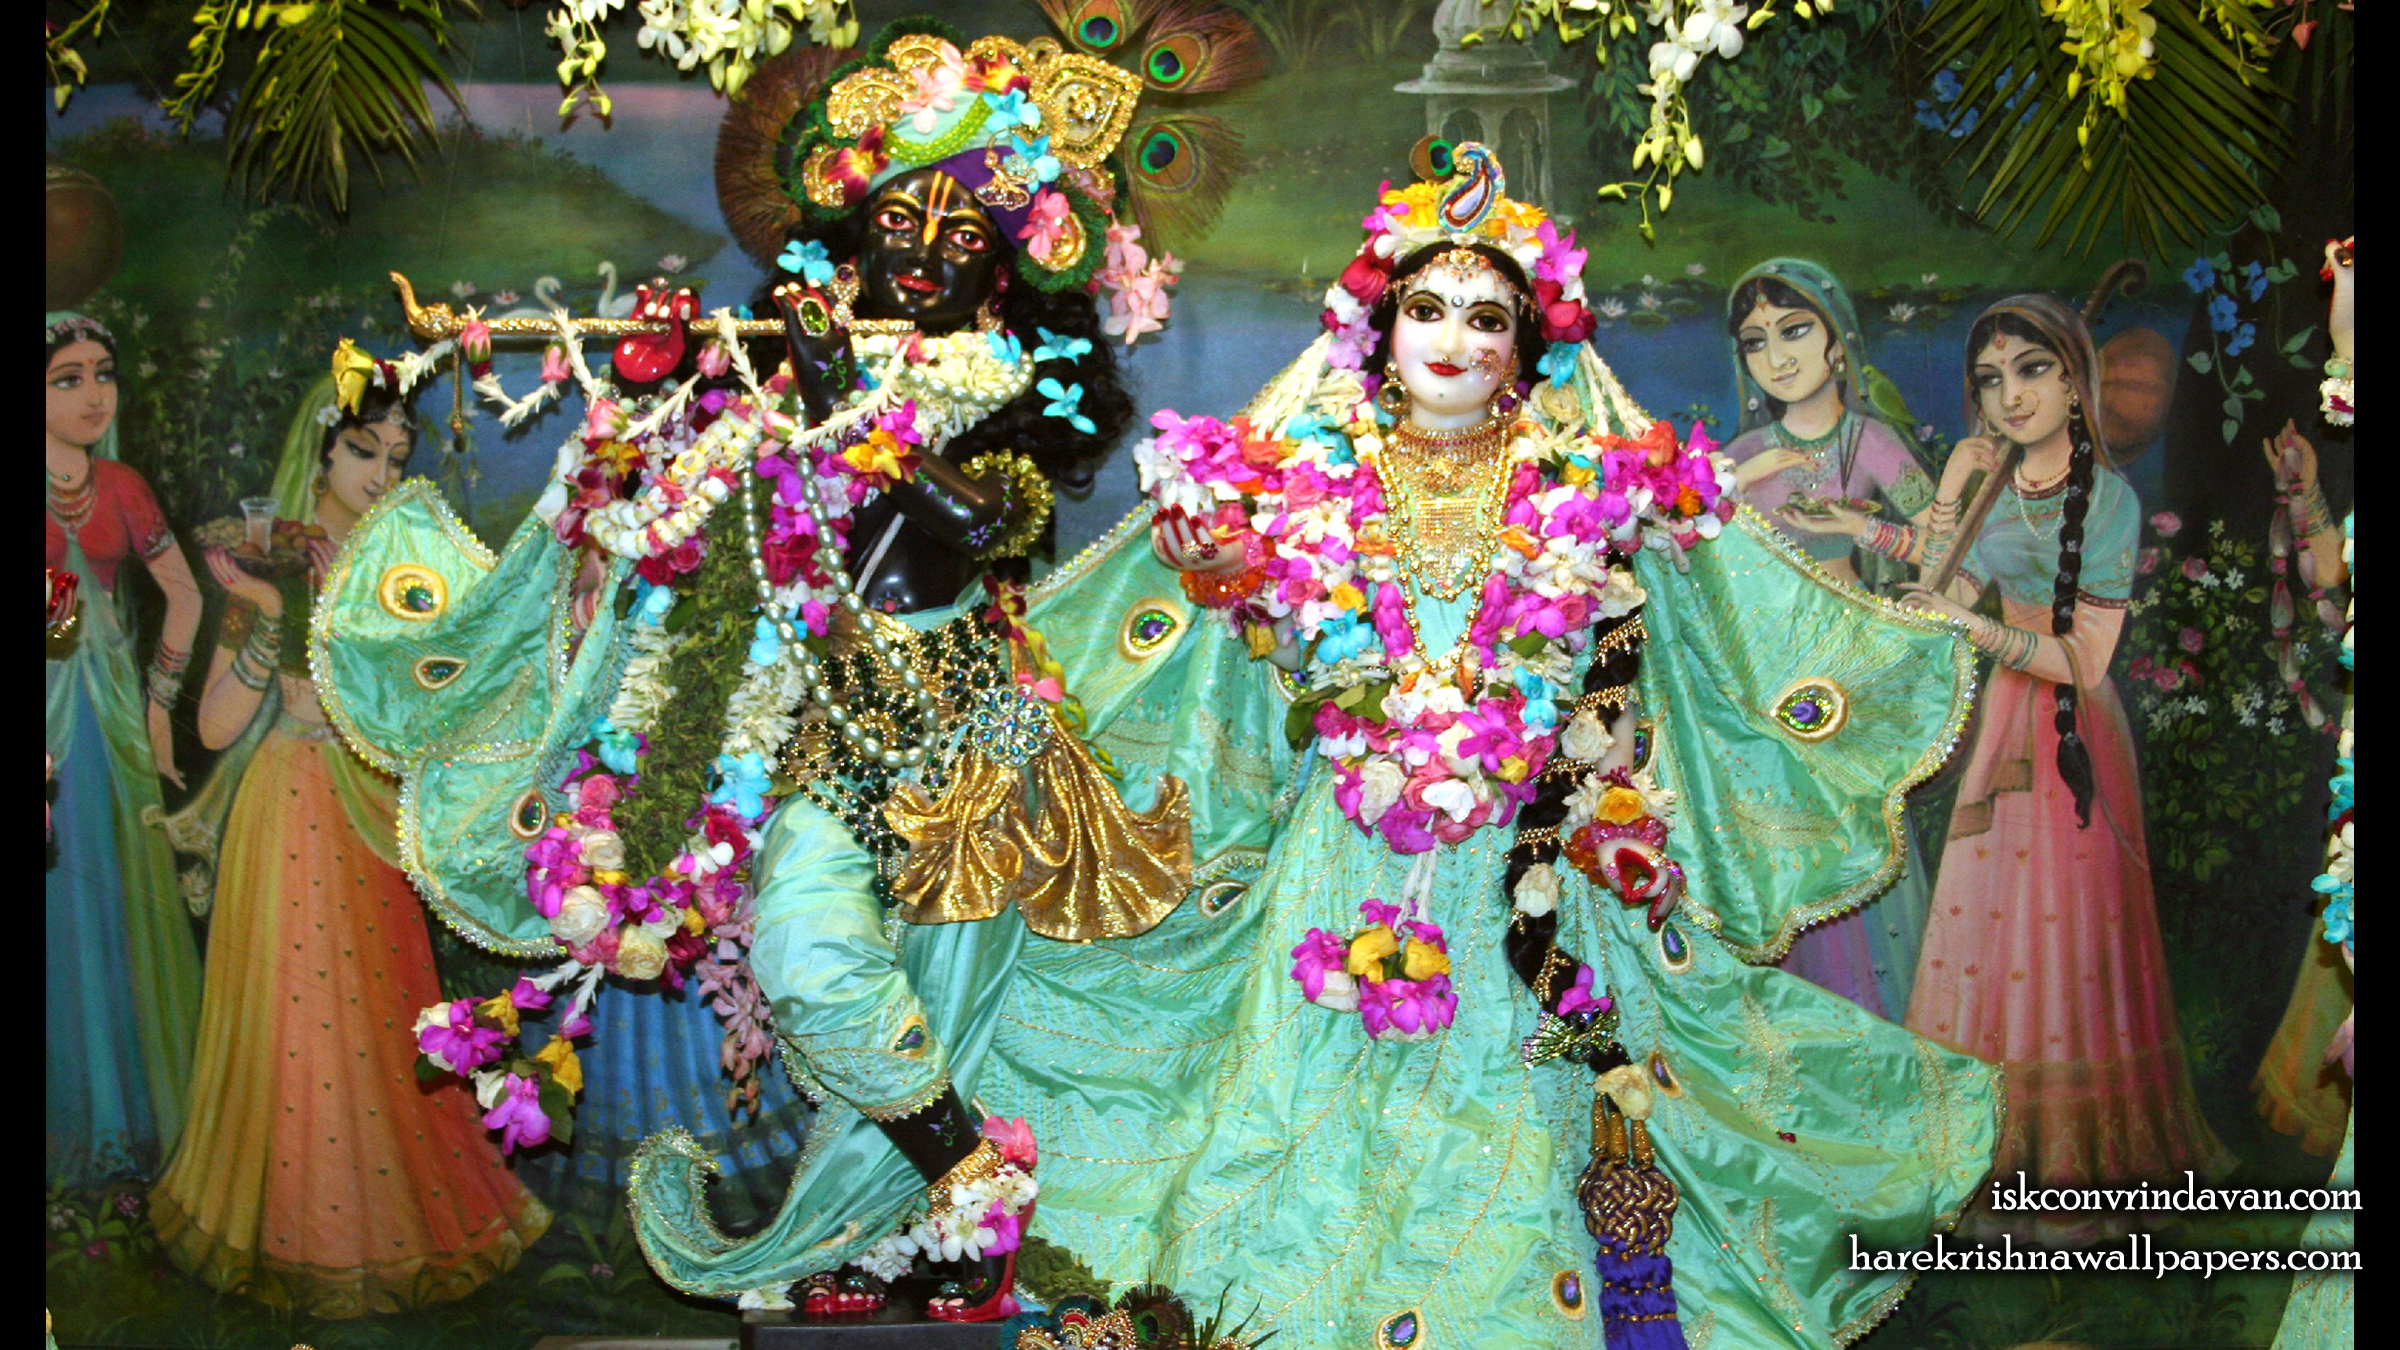 Sri Sri Radha Shyamsundar Wallpaper (005) Size 2400x1350 Download